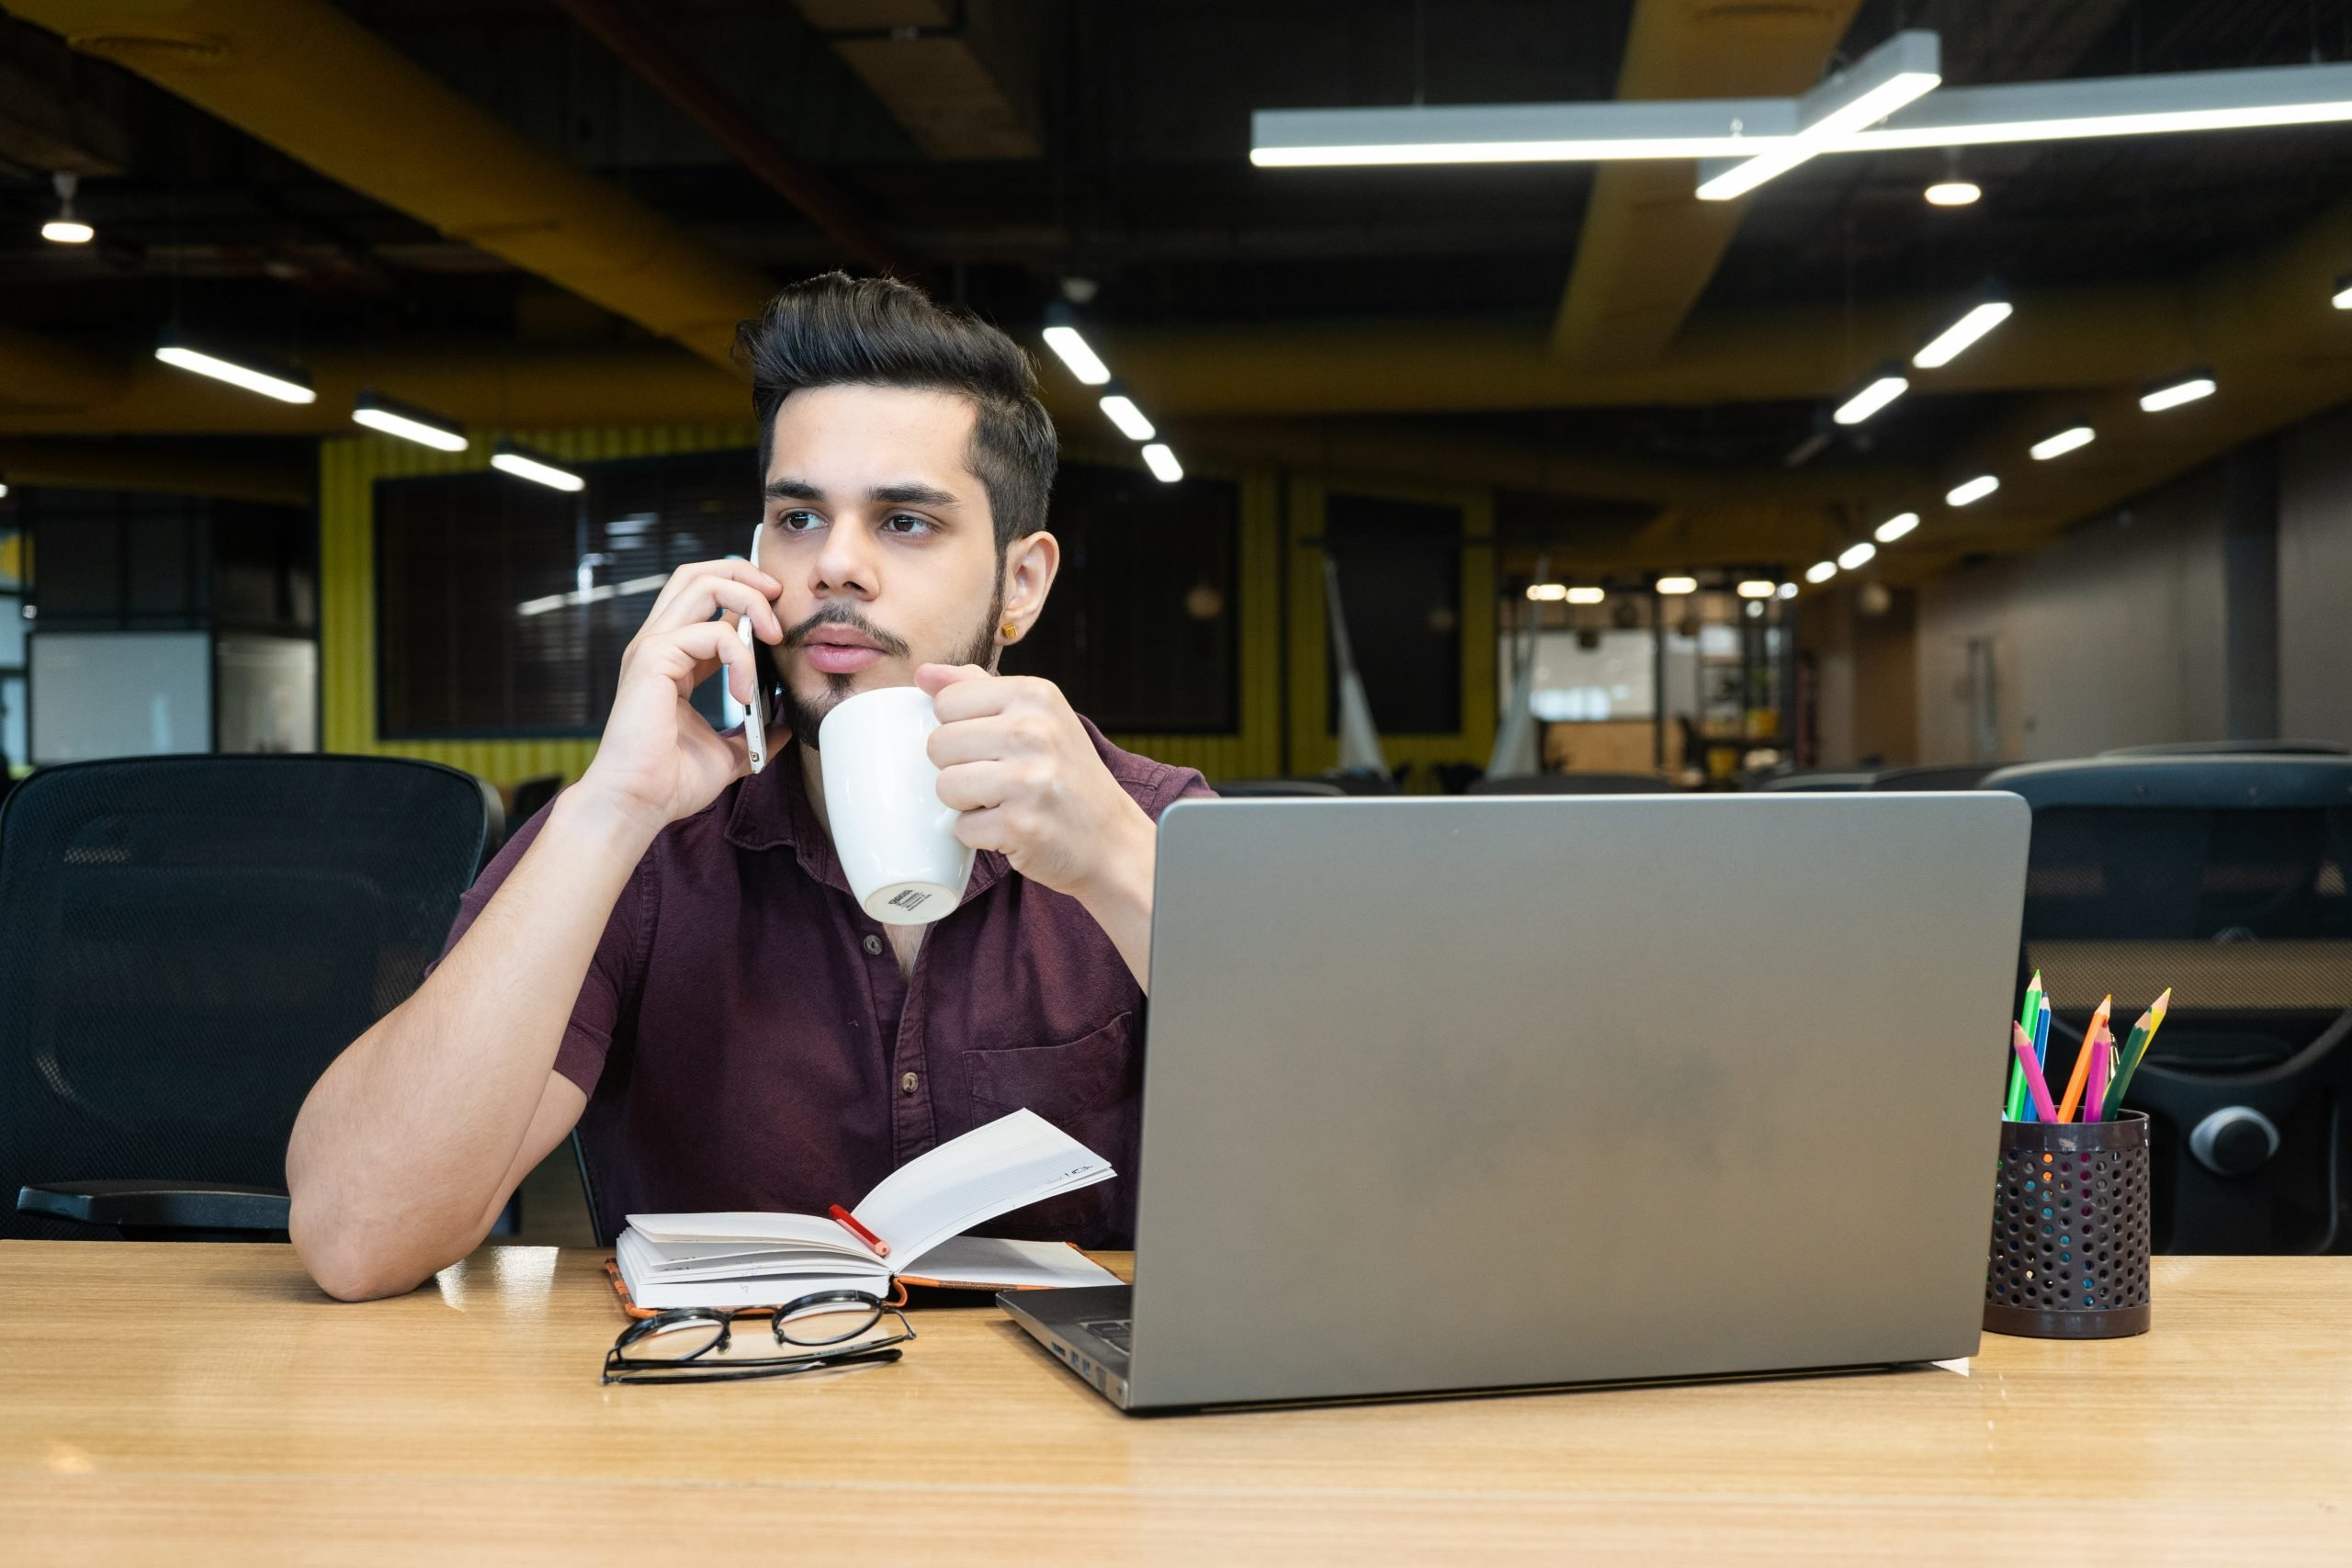 Employee listening to call